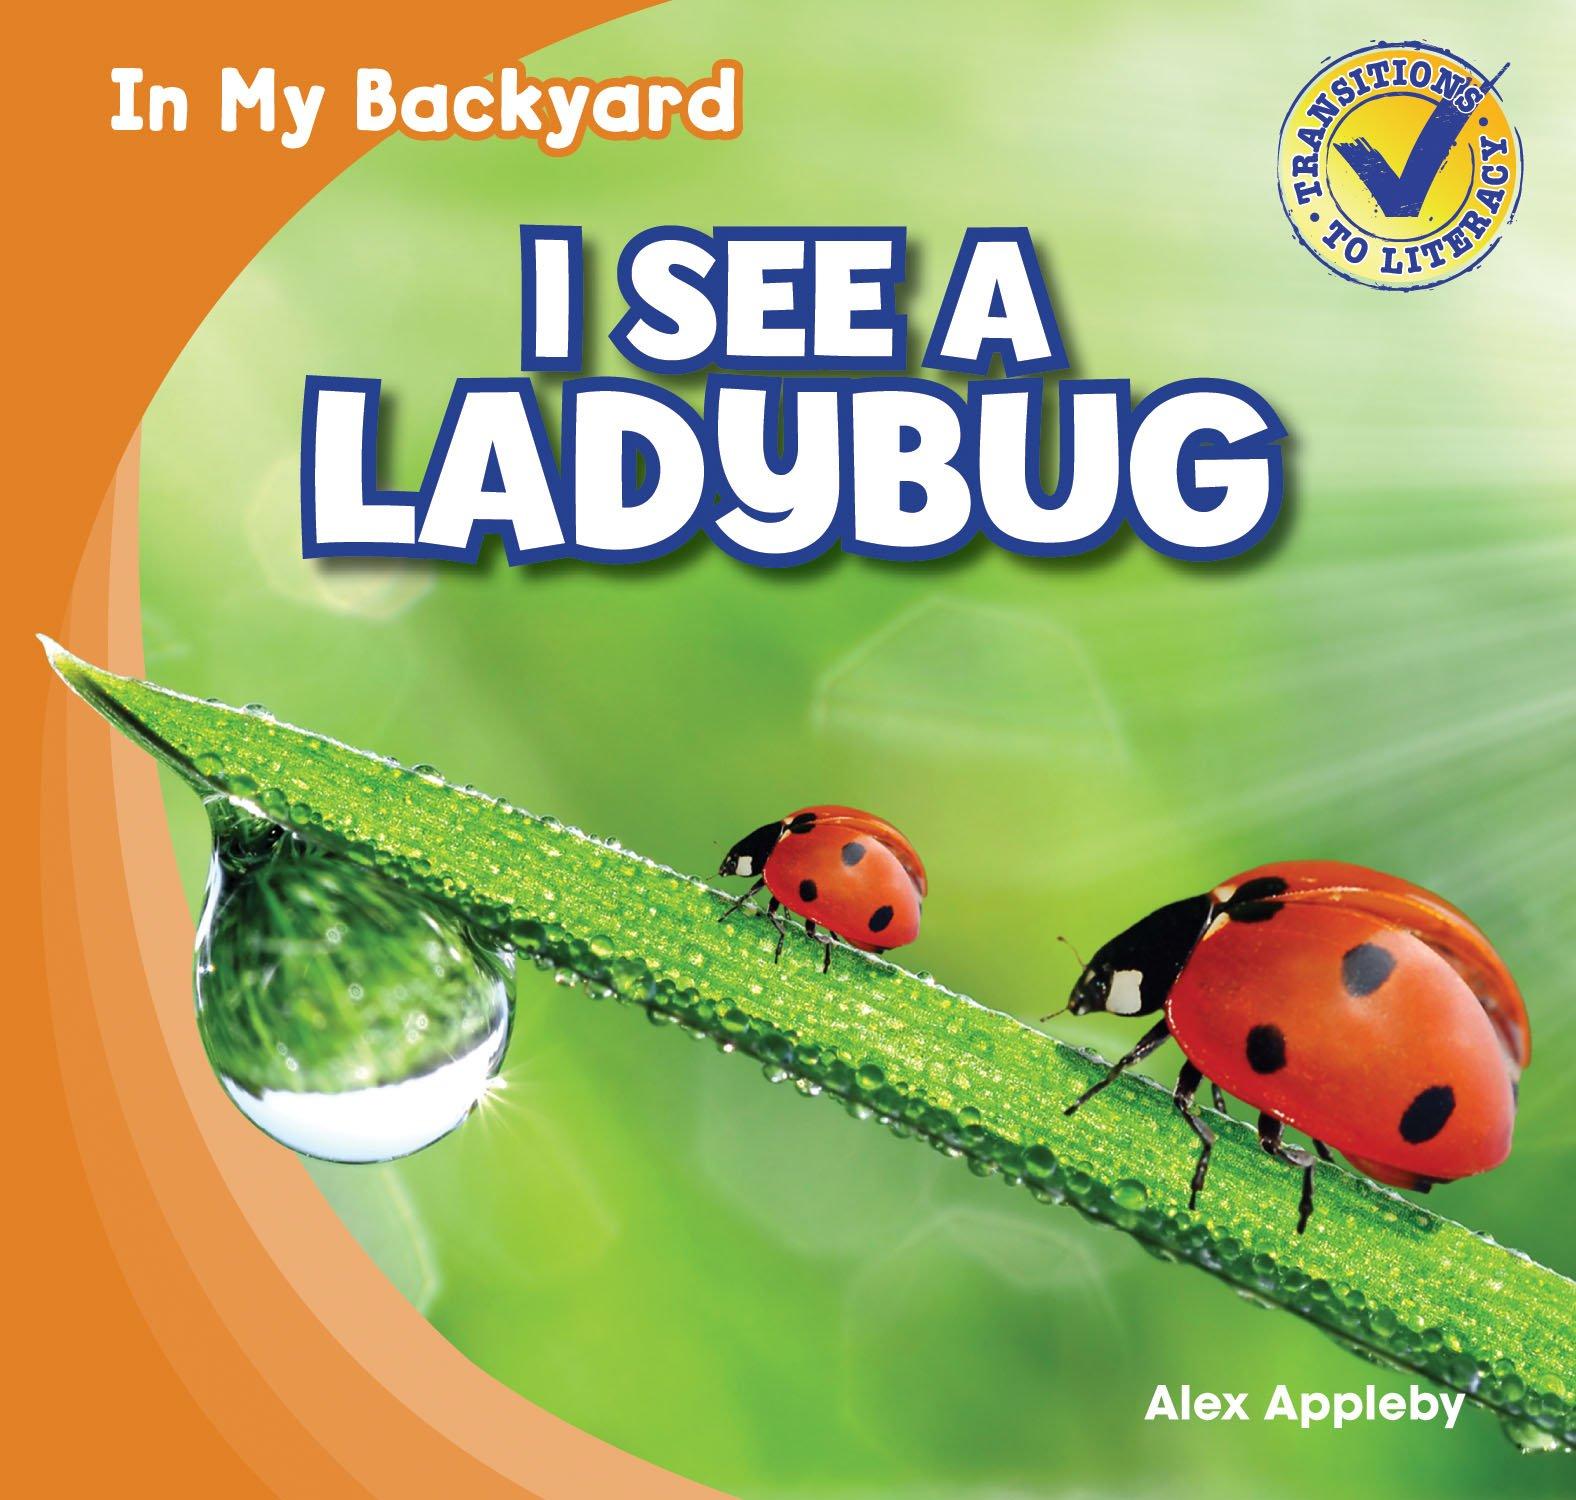 I See a Ladybug (In My Backyard) by Gareth Stevens Leveled Readers